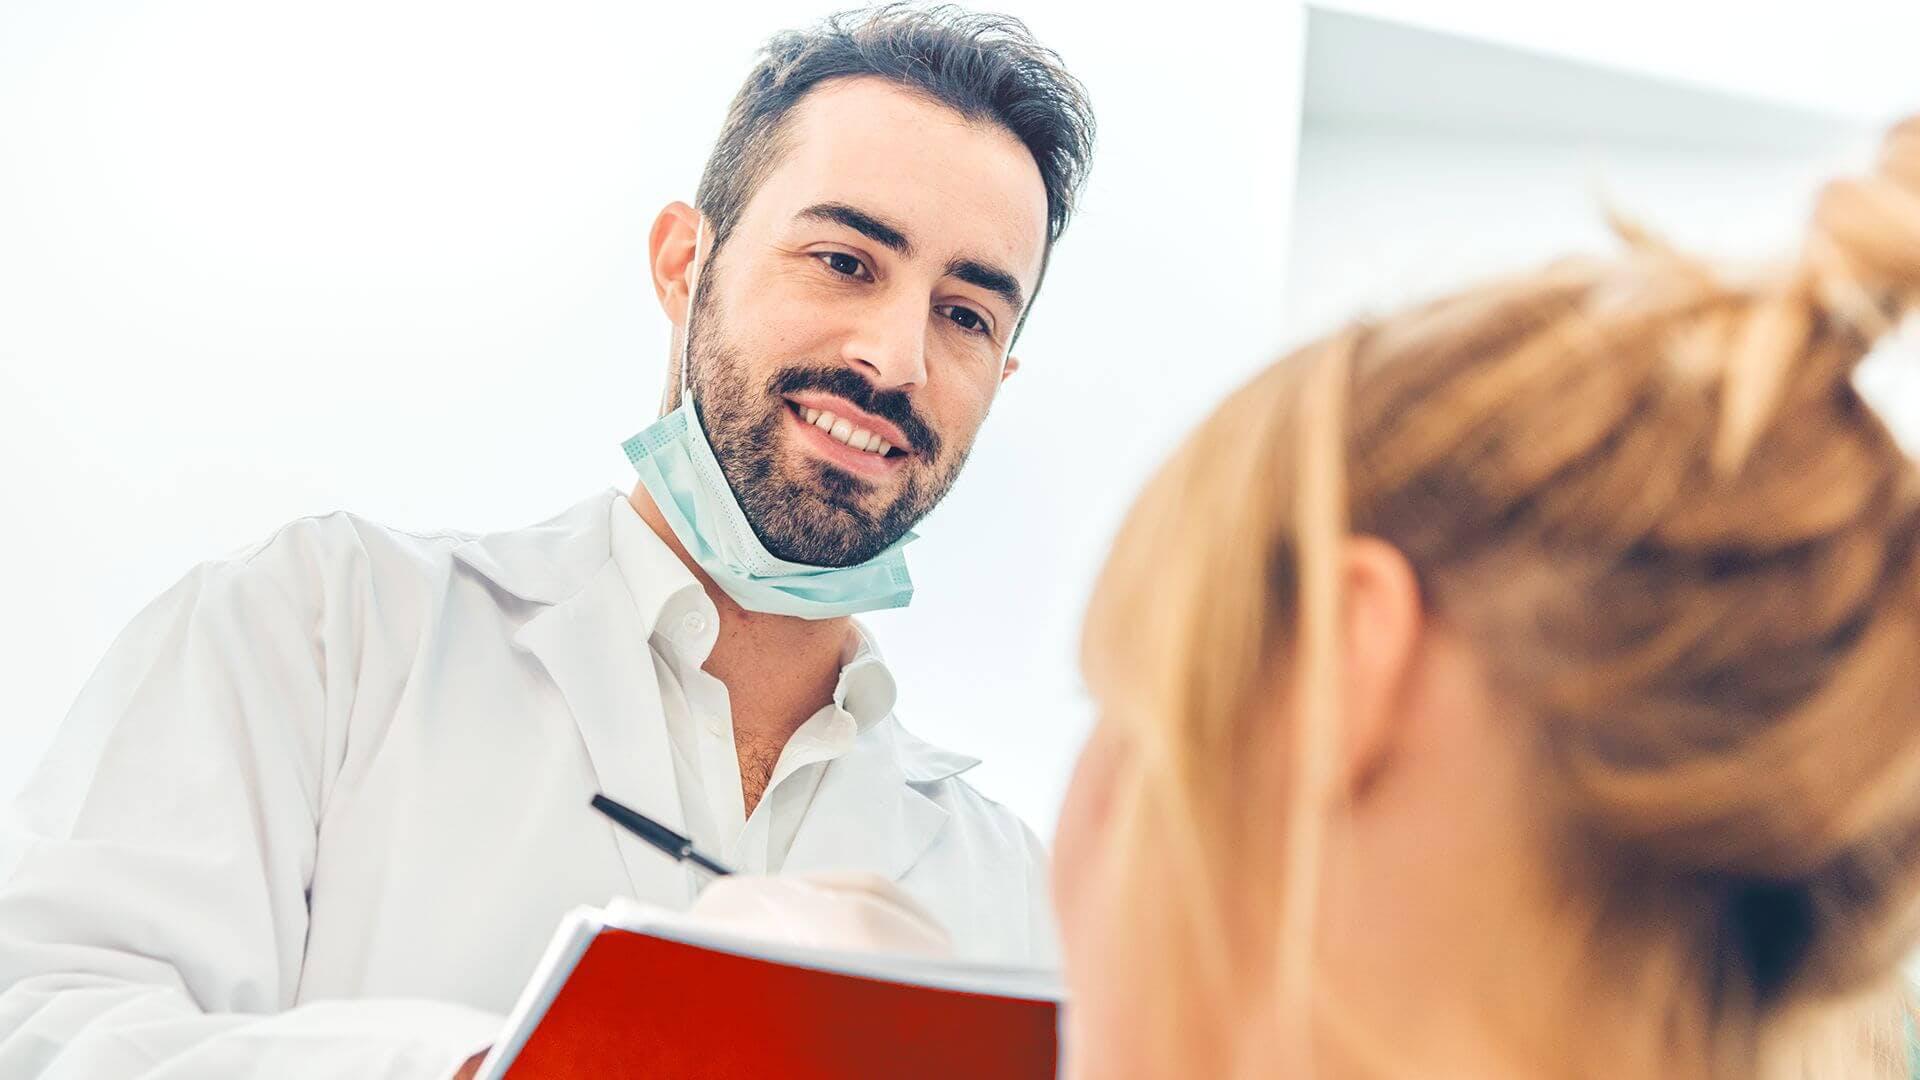 Zahnarzt berät Patienten